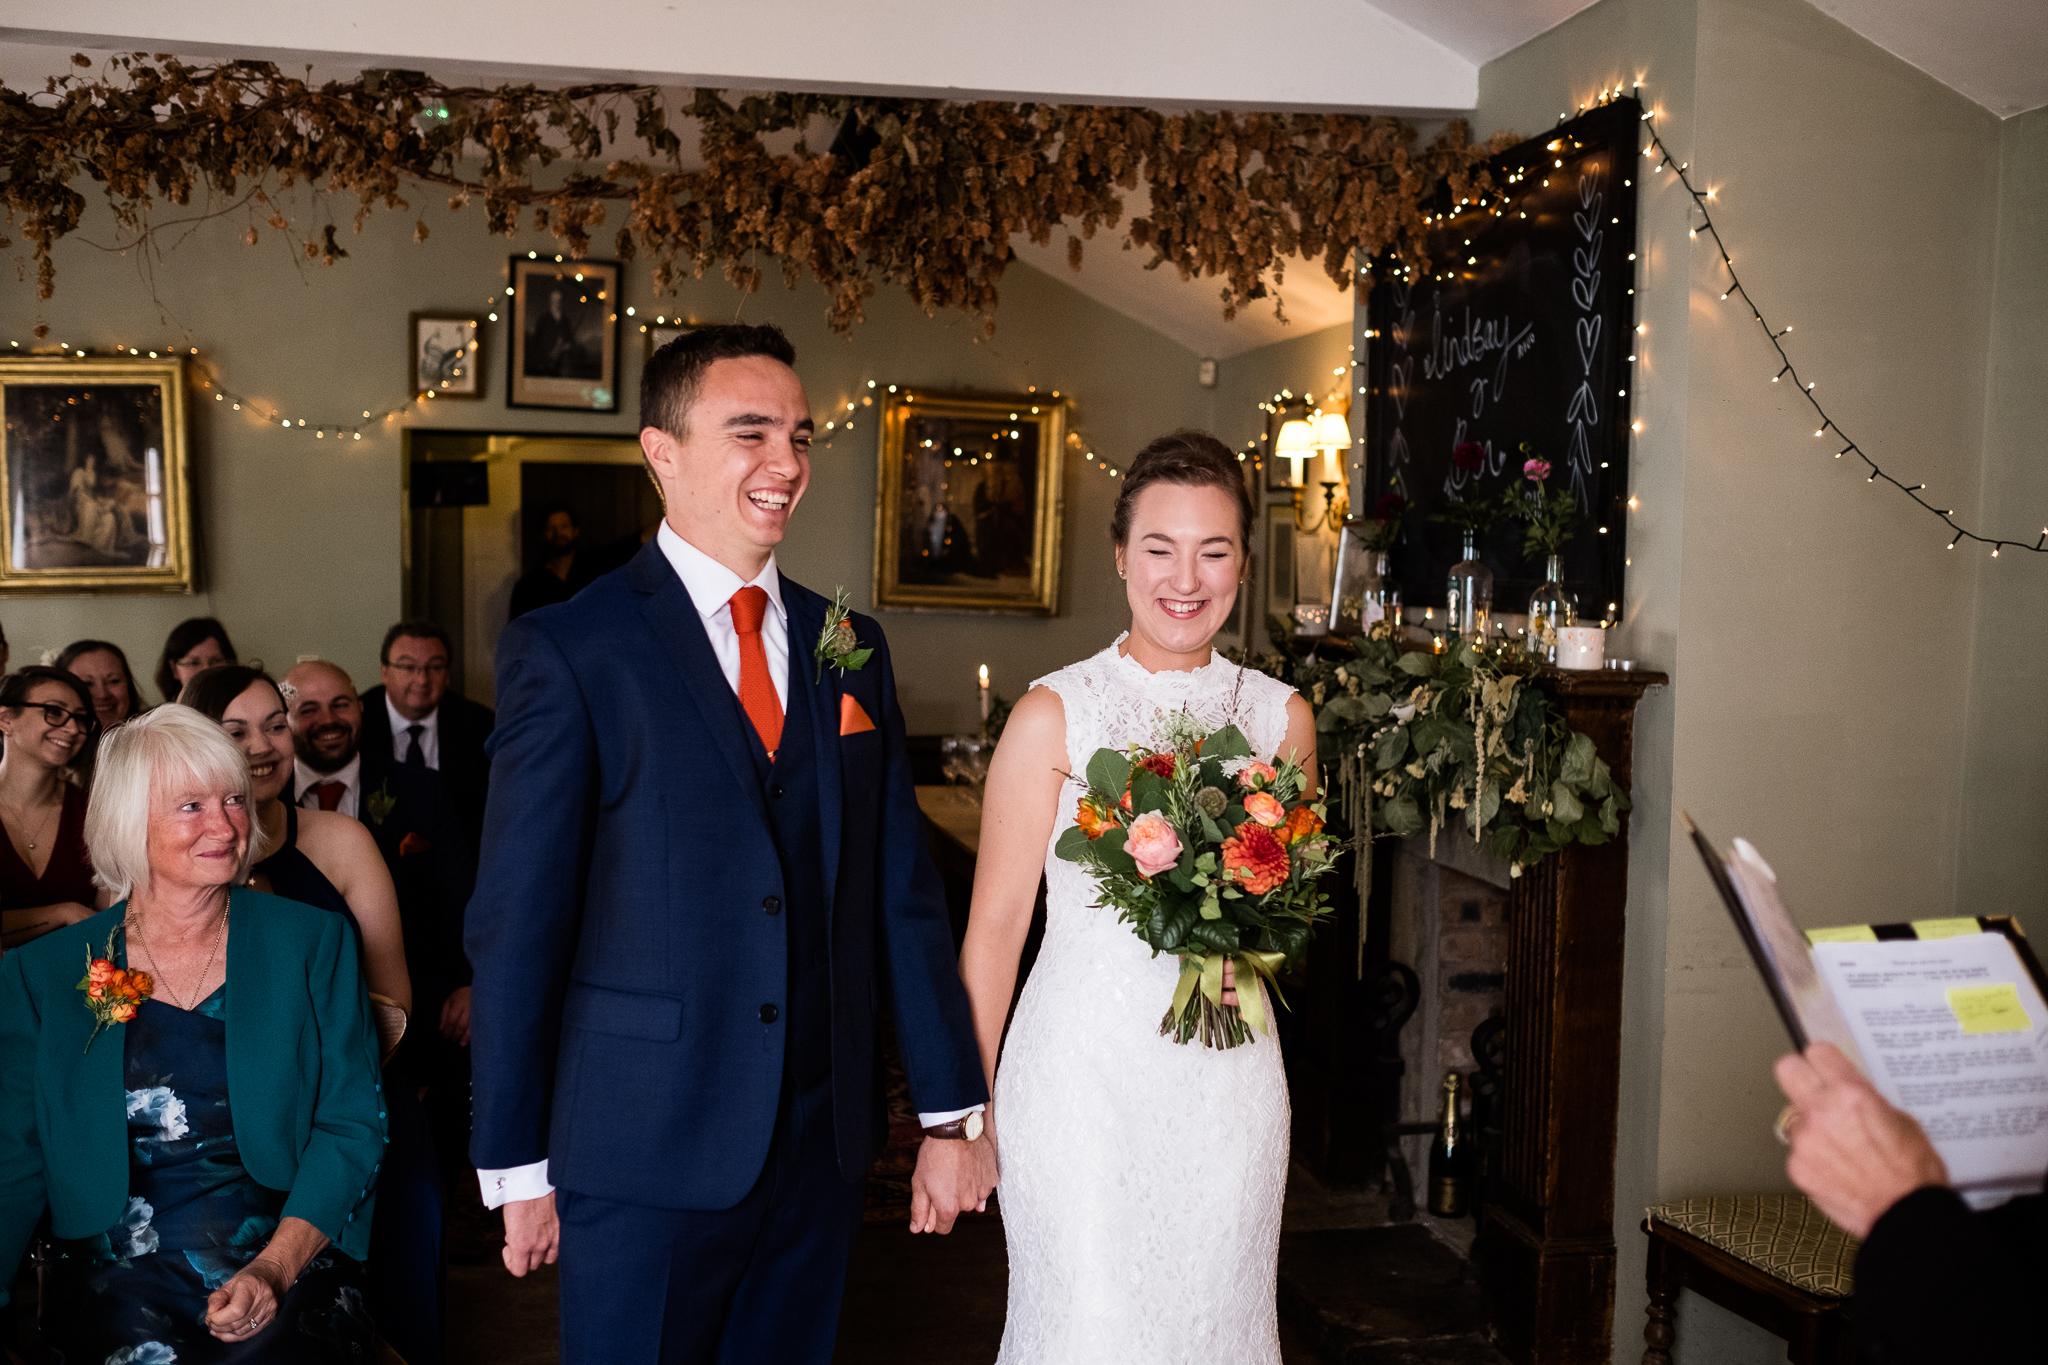 Relaxed Documentary Wedding Photography at The Wizard Inn, Alderley Edge Cheshire - Jenny Harper-25.jpg